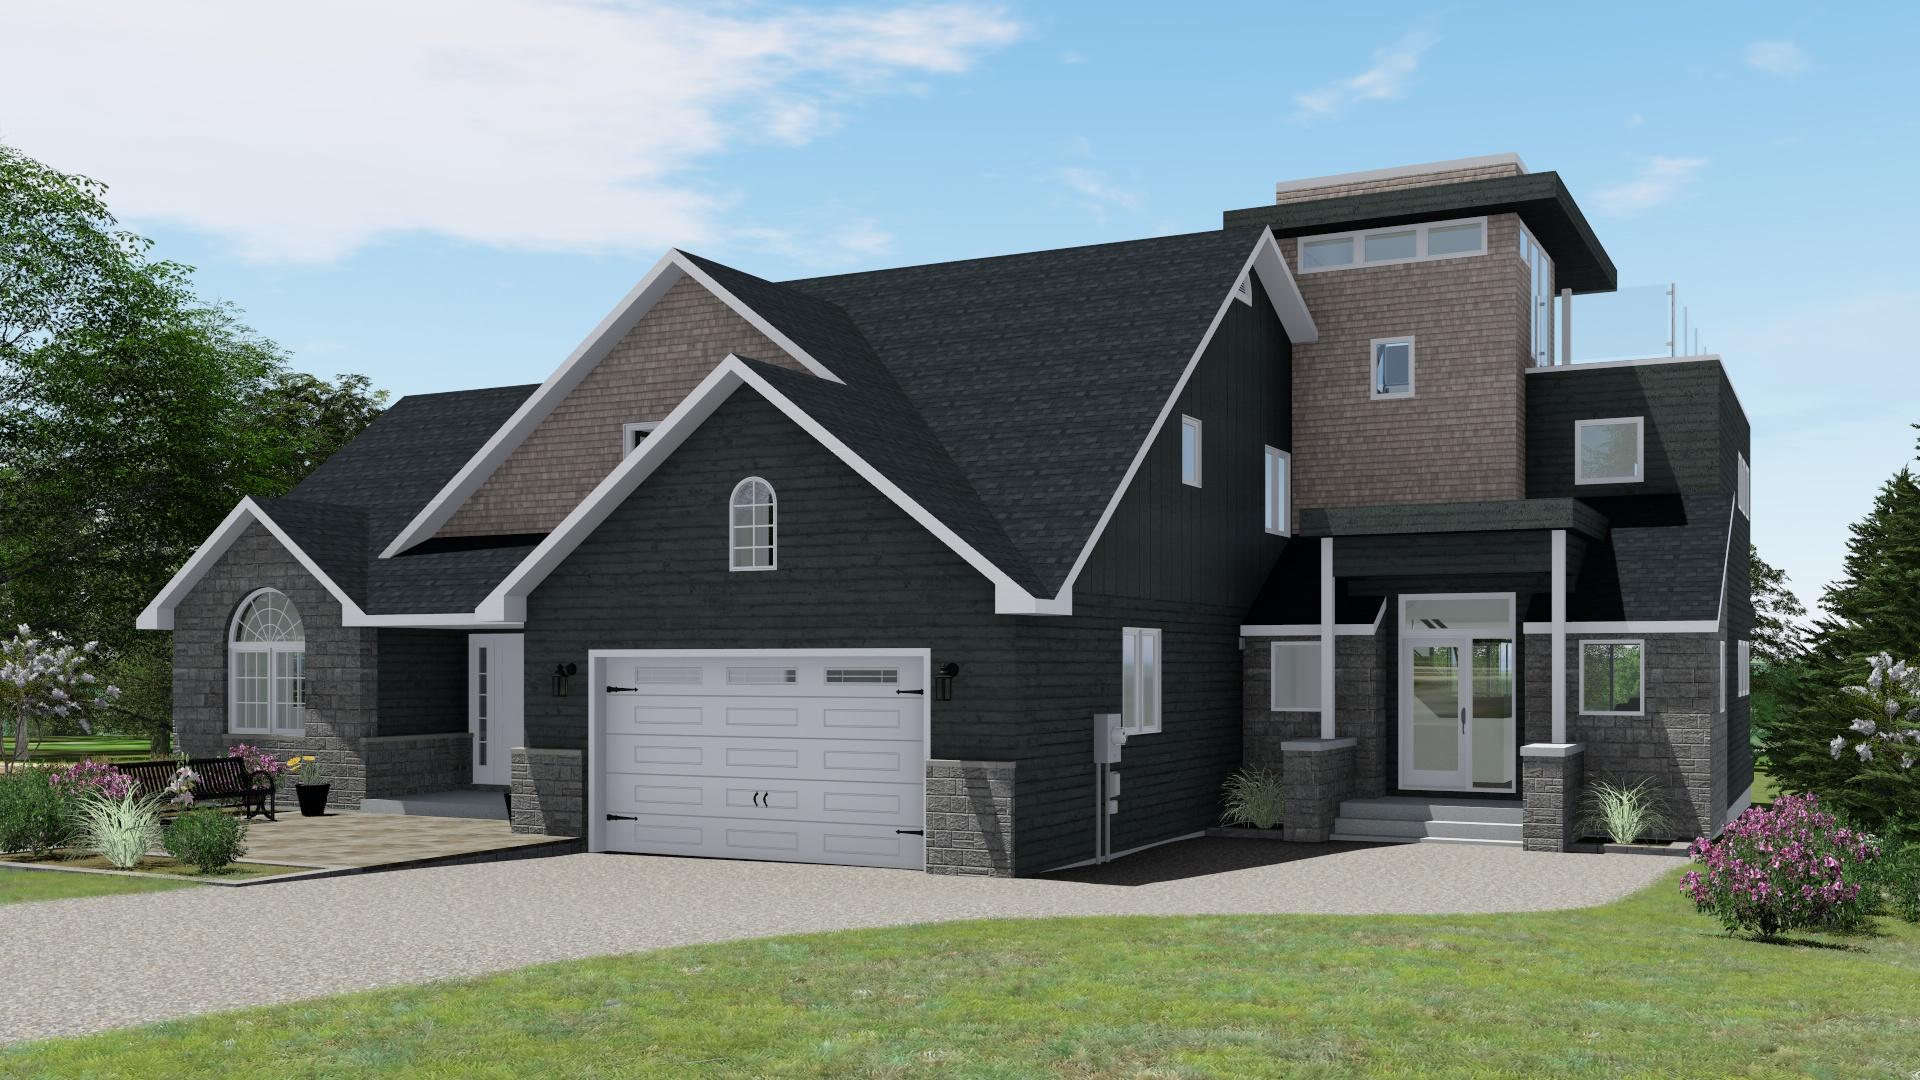 Option 3 - Shed w/ Flat Roof